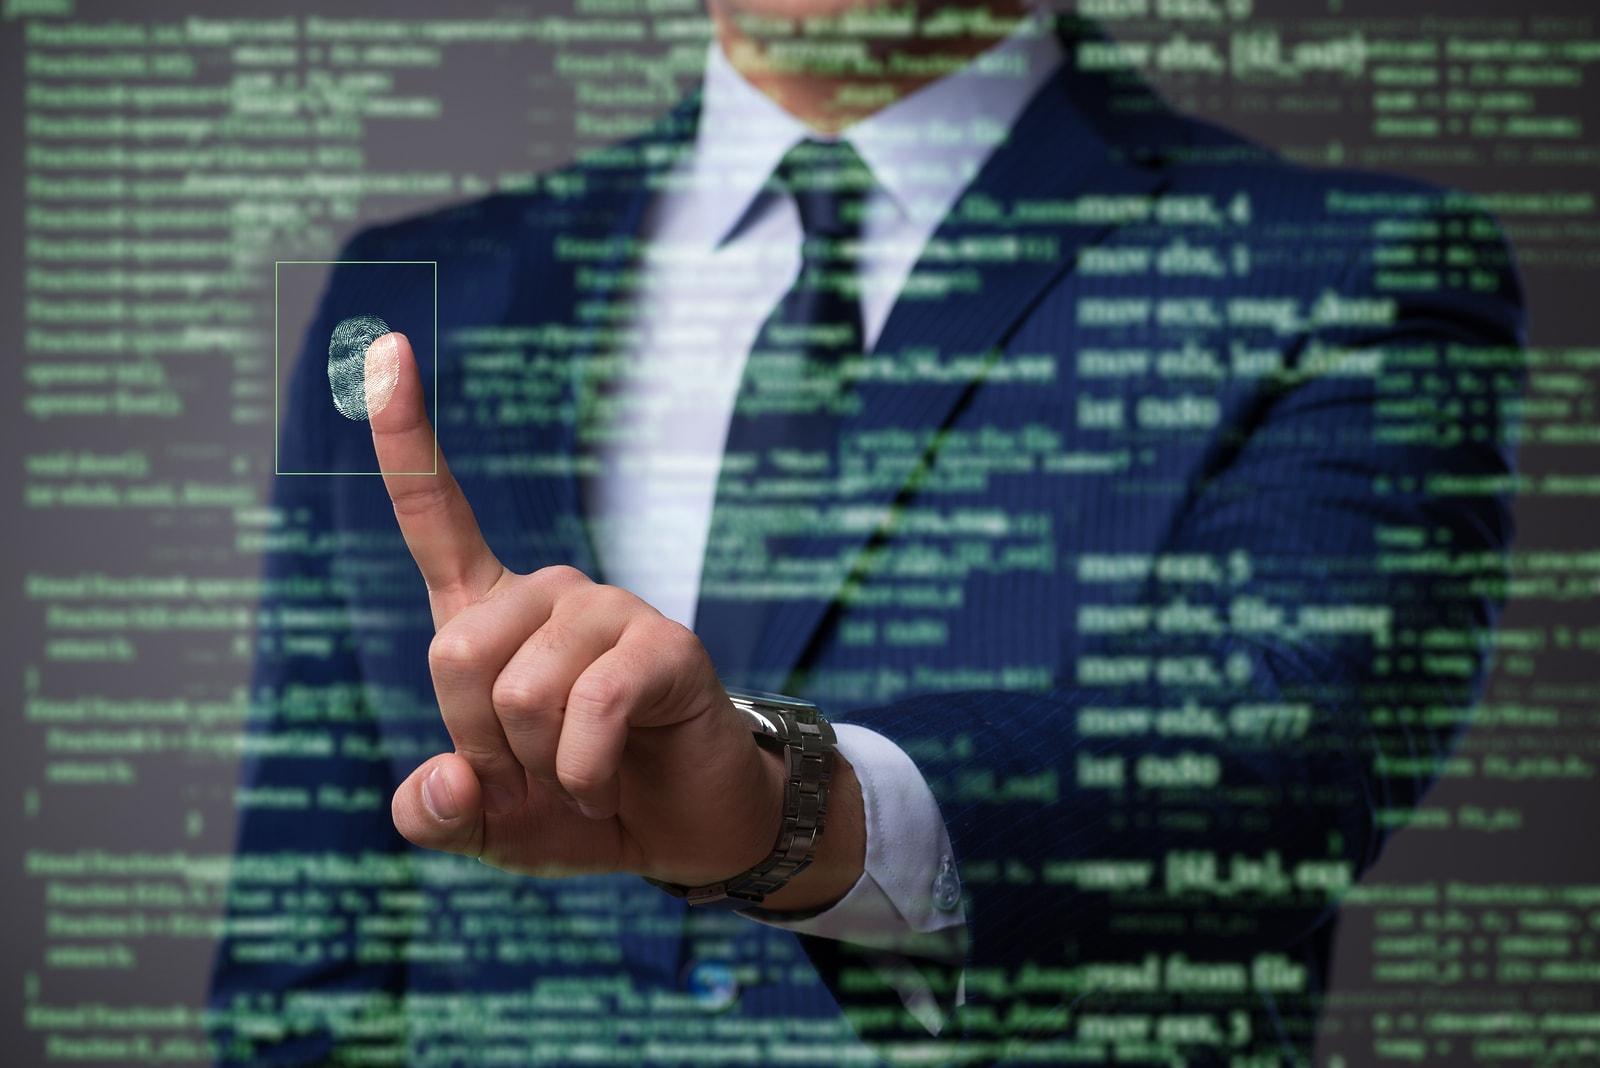 bigstock-Biometric-identification-conce-170689547-min